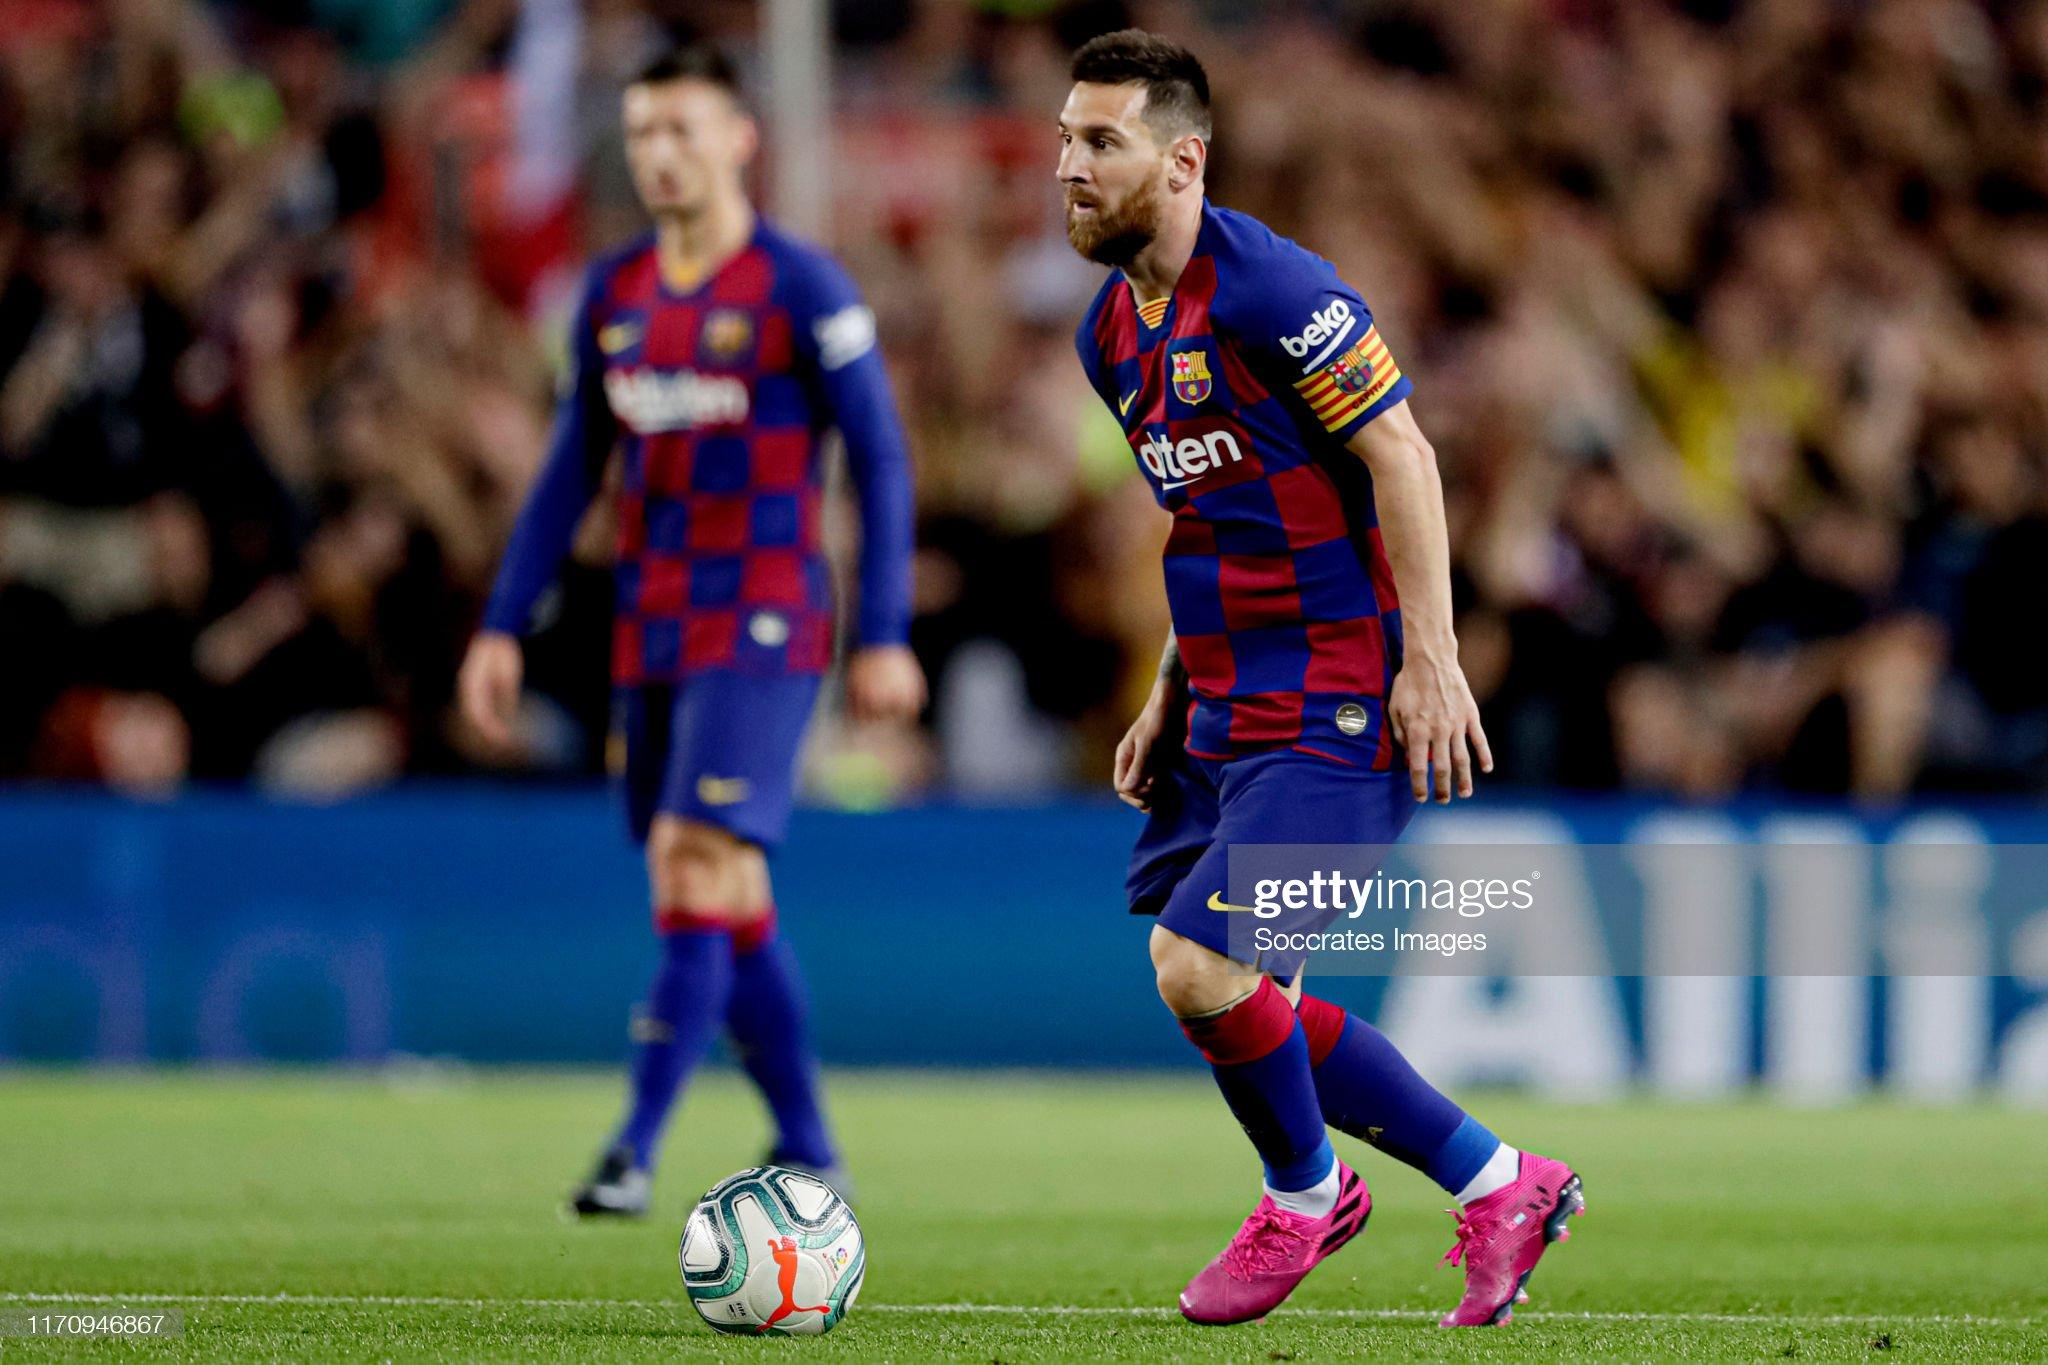 صور مباراة : برشلونة - فياريال 2-1 ( 24-09-2019 )  Lionel-messi-of-fc-barcelona-during-the-la-liga-santander-match-fc-picture-id1170946867?s=2048x2048